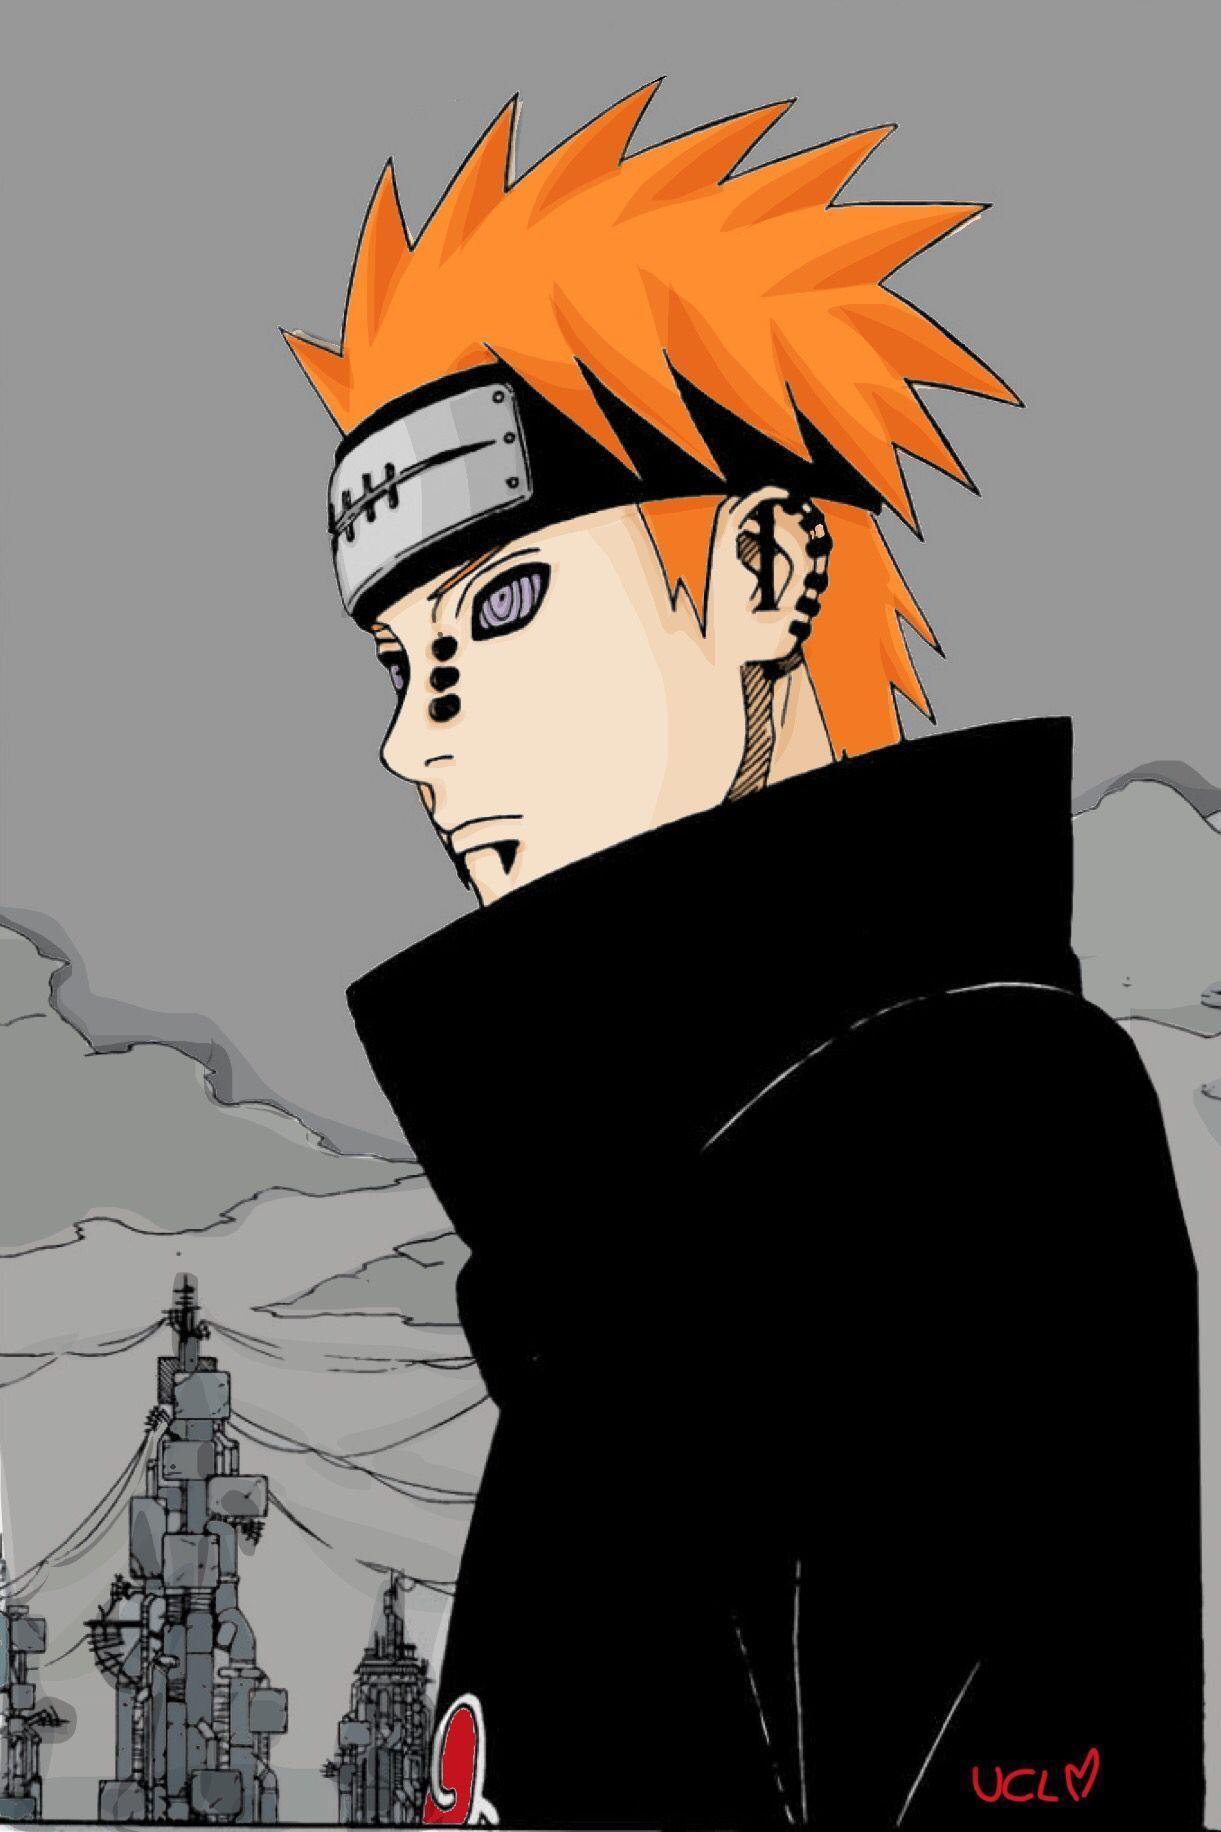 Naruto Shippuden Pain Wallpapers Top Free Naruto Shippuden Pain Backgrounds Wallpaperaccess